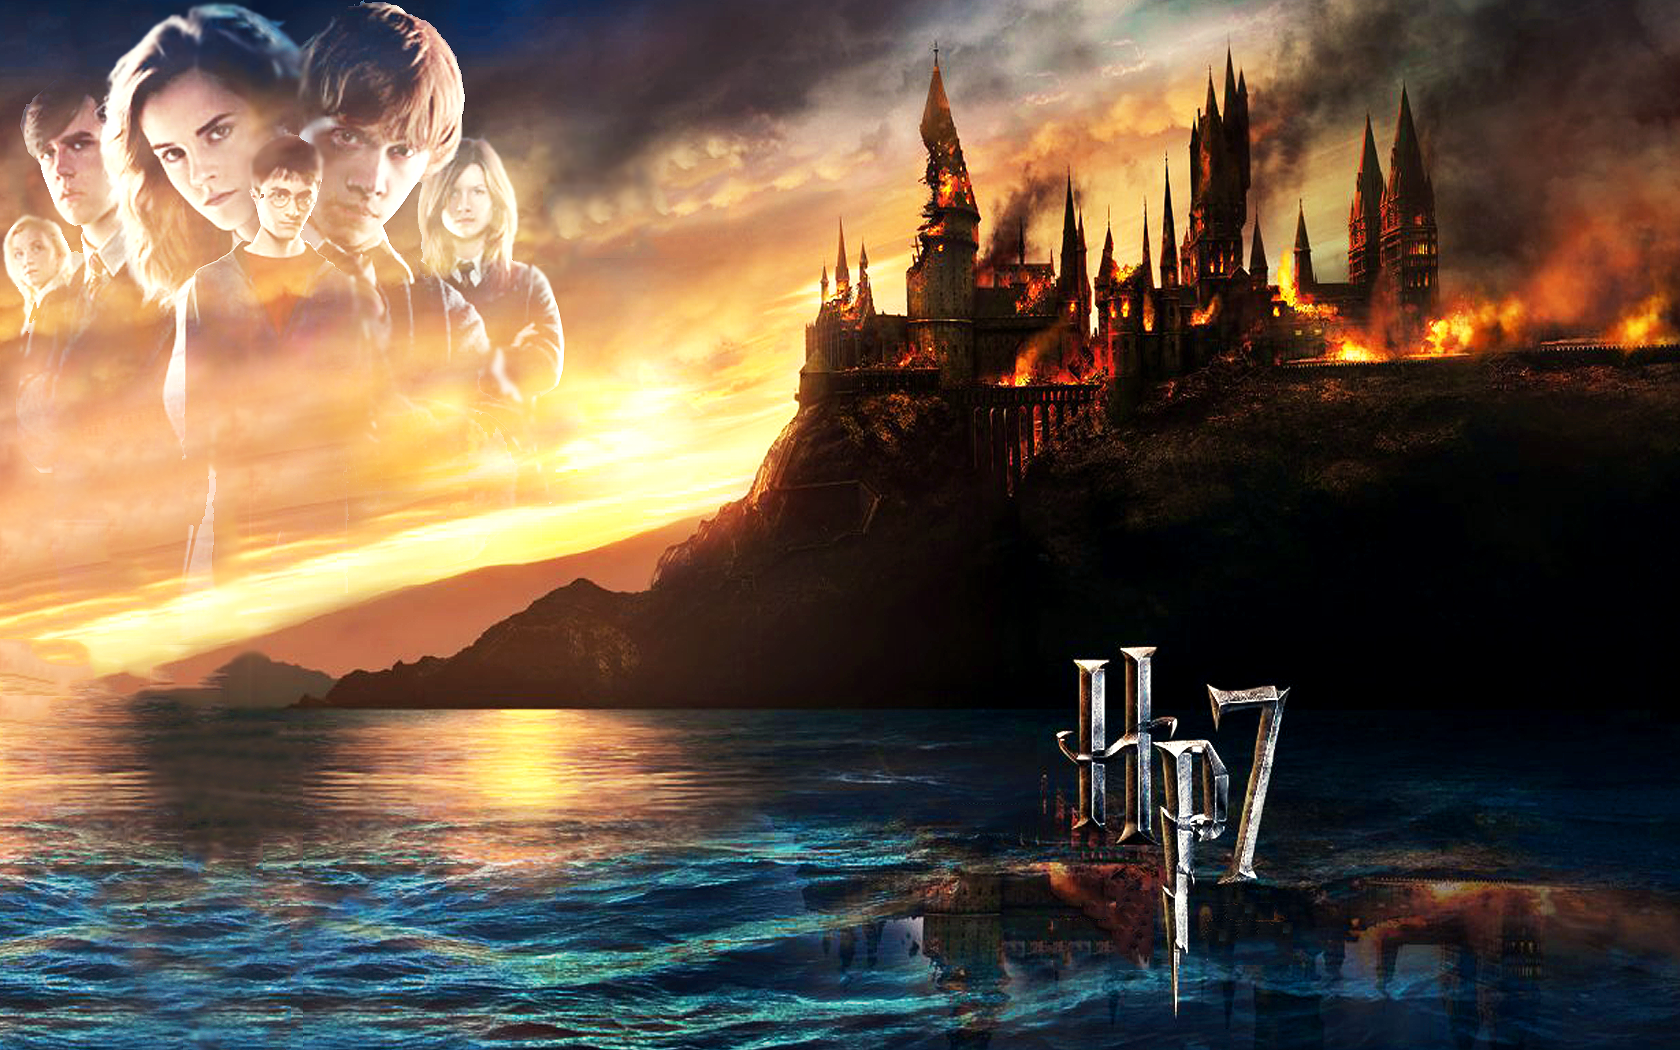 Harry Potter Harry Potter Wallpaper Backgrounds Harry Potter Wallpaper Desktop Wallpaper Harry Potter